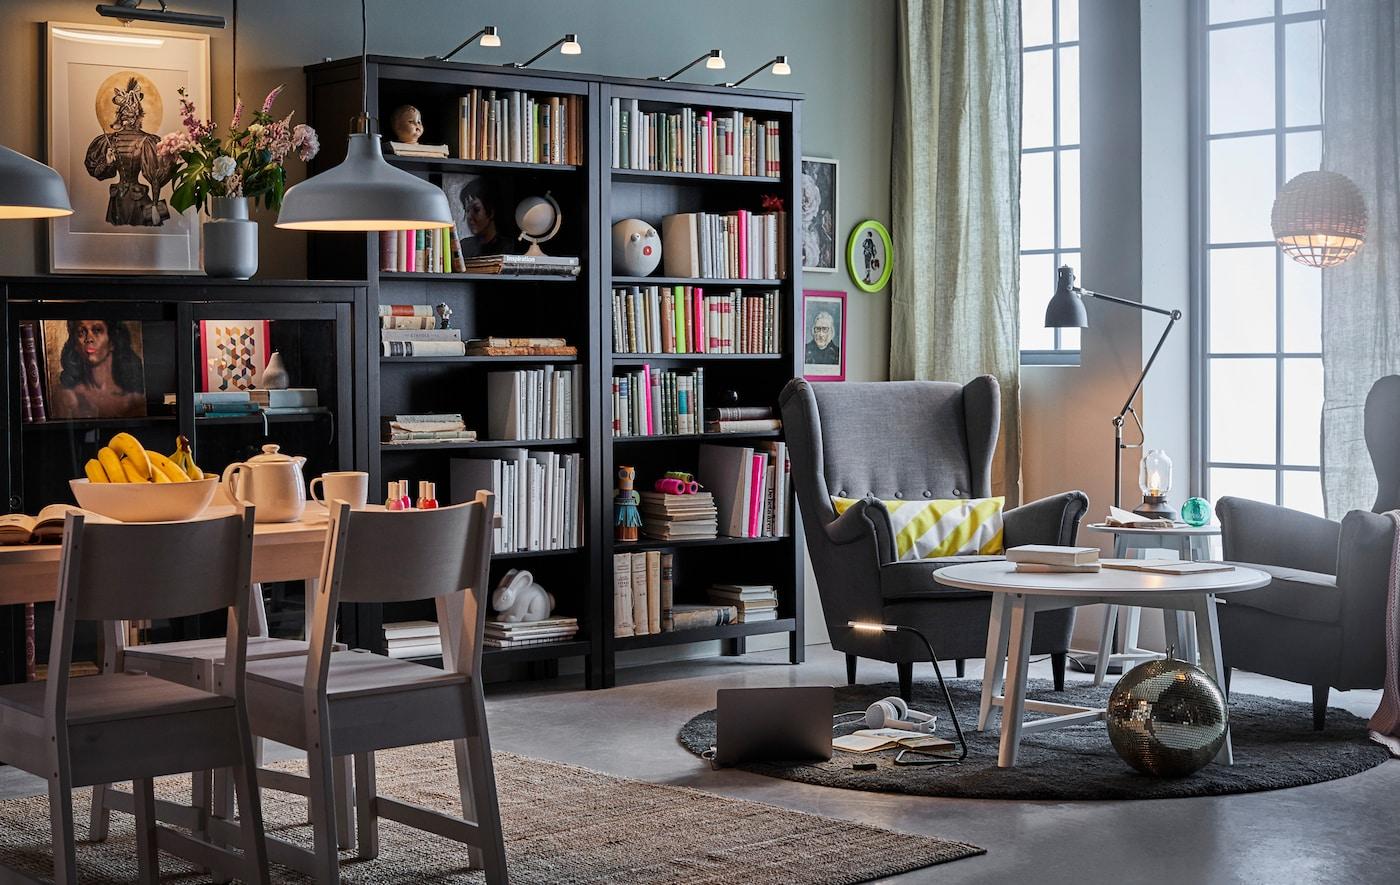 Orienta la luce dove vuoi con la lampada da terra/lettura a LED regolabile ARÖD di IKEA.